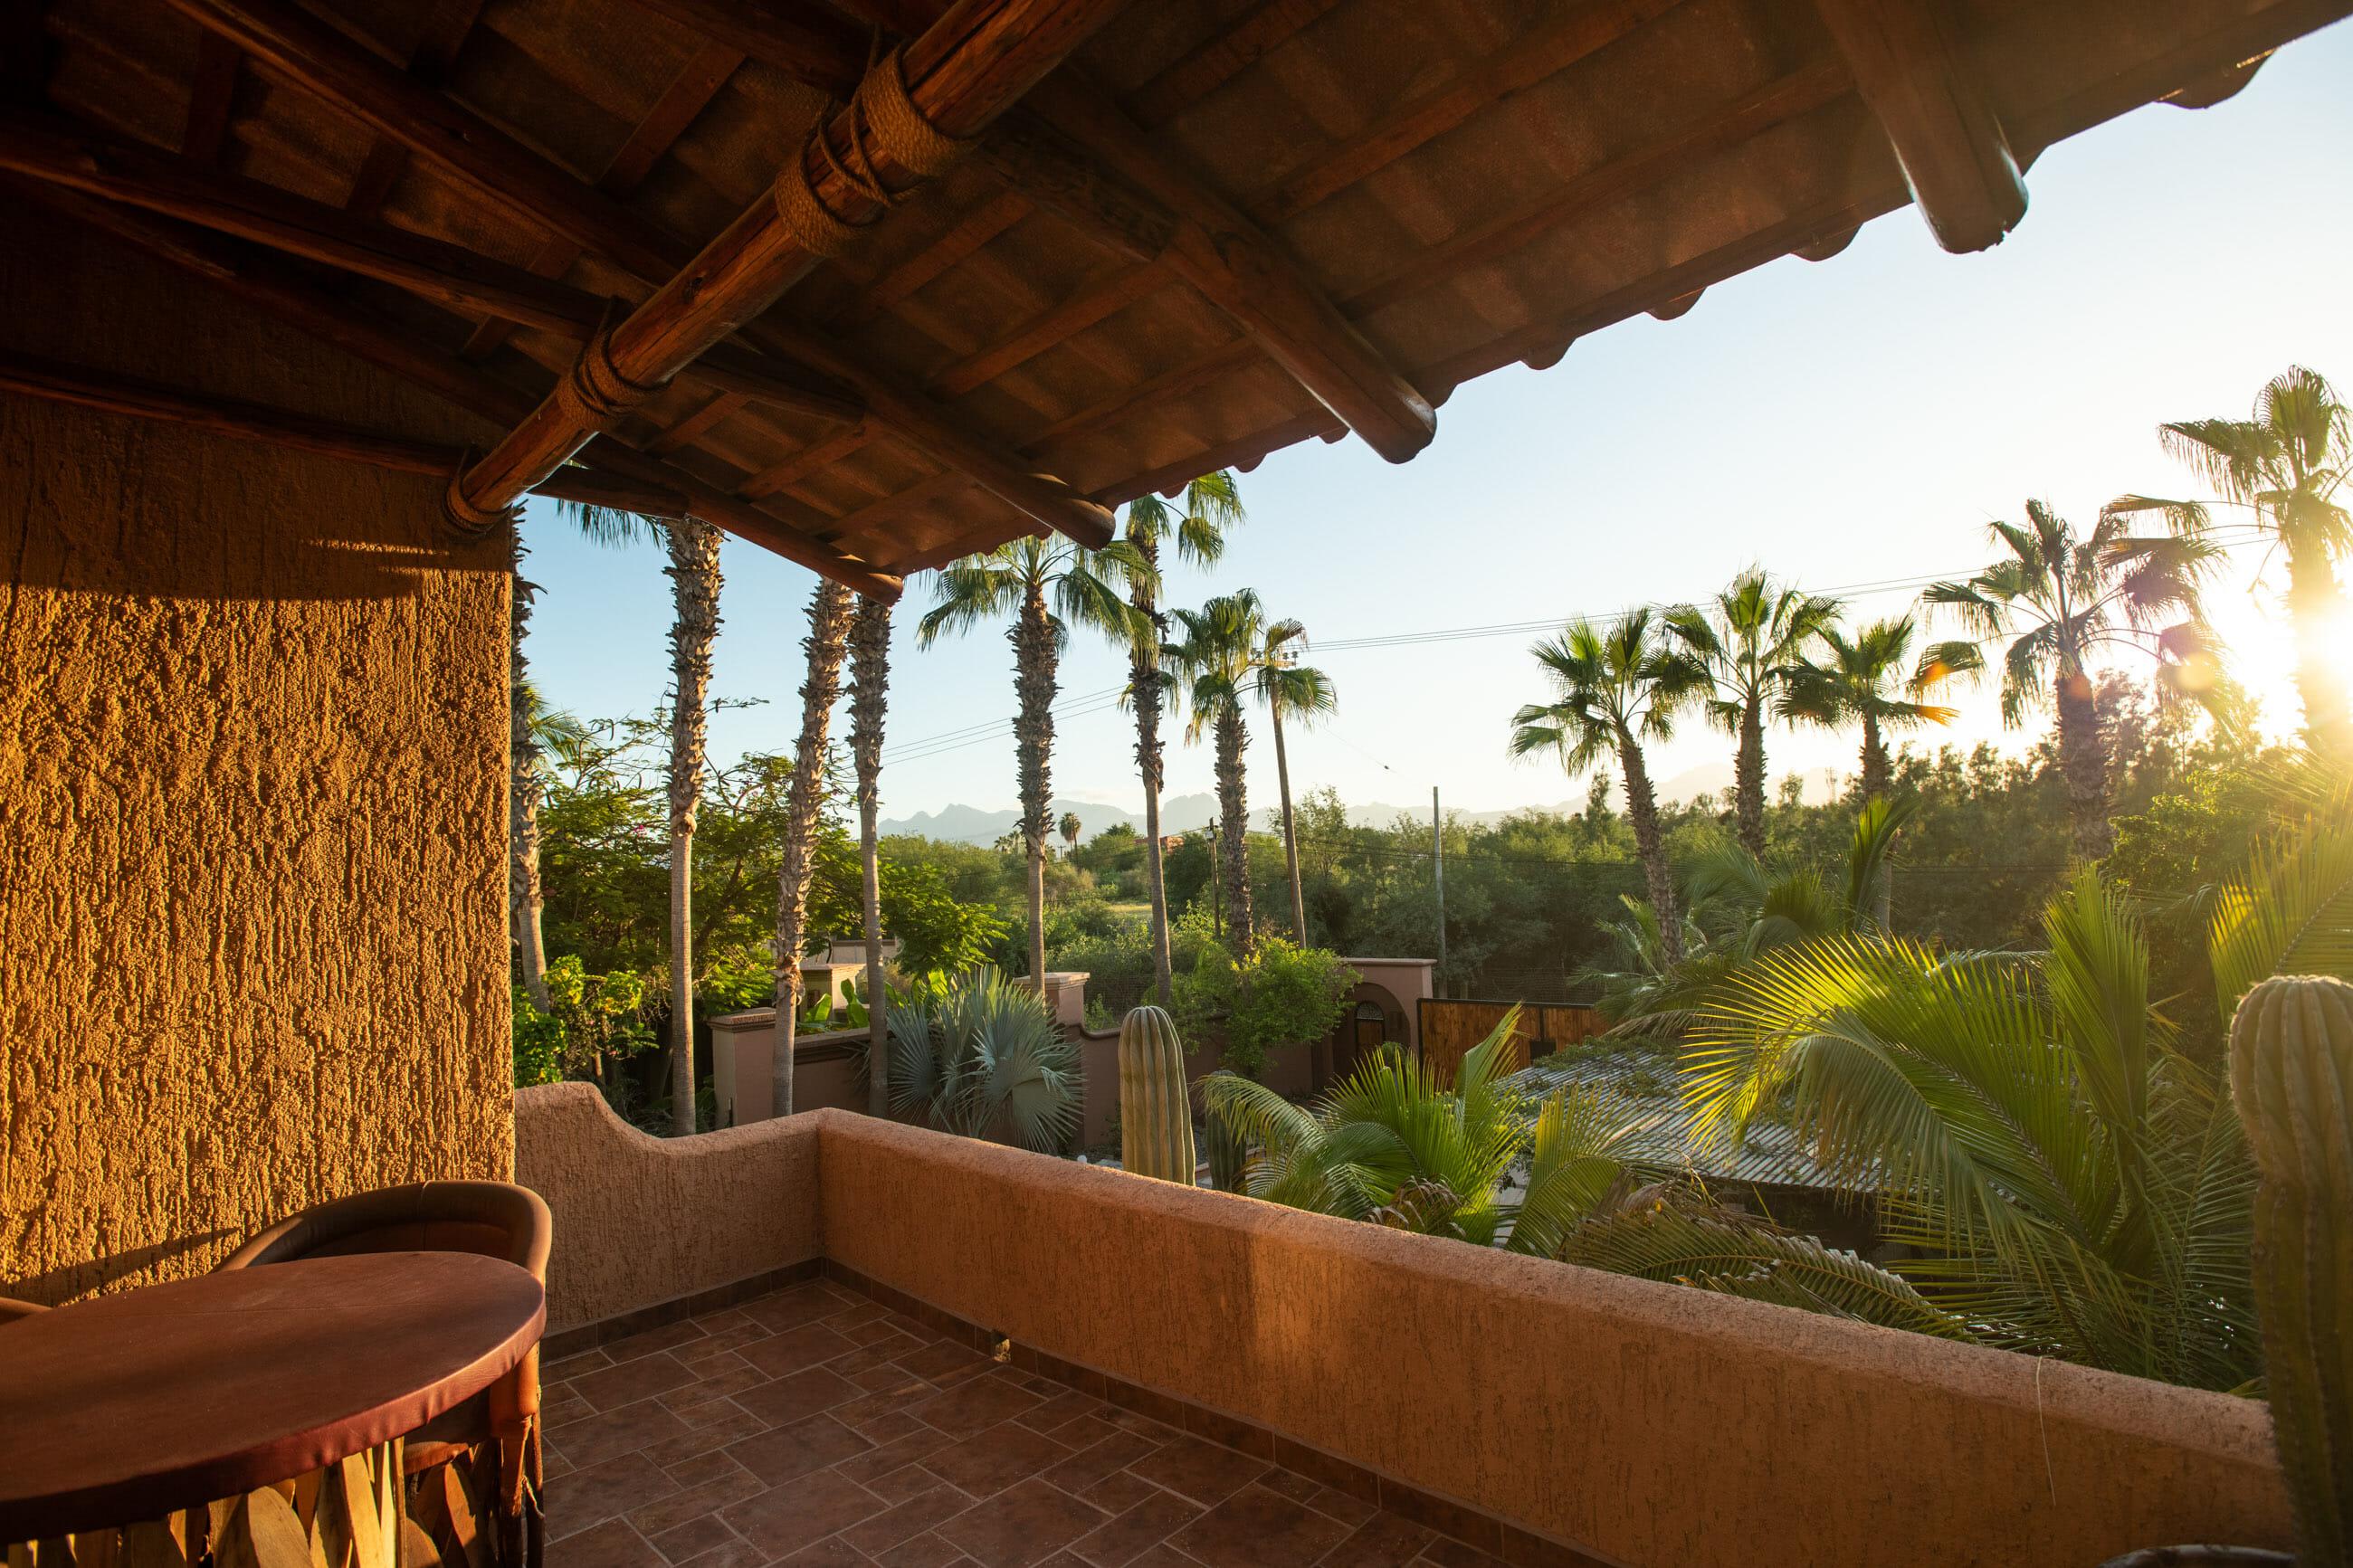 288 Davis St Loreto, Baja California Sur Mexico: second floor front terrace